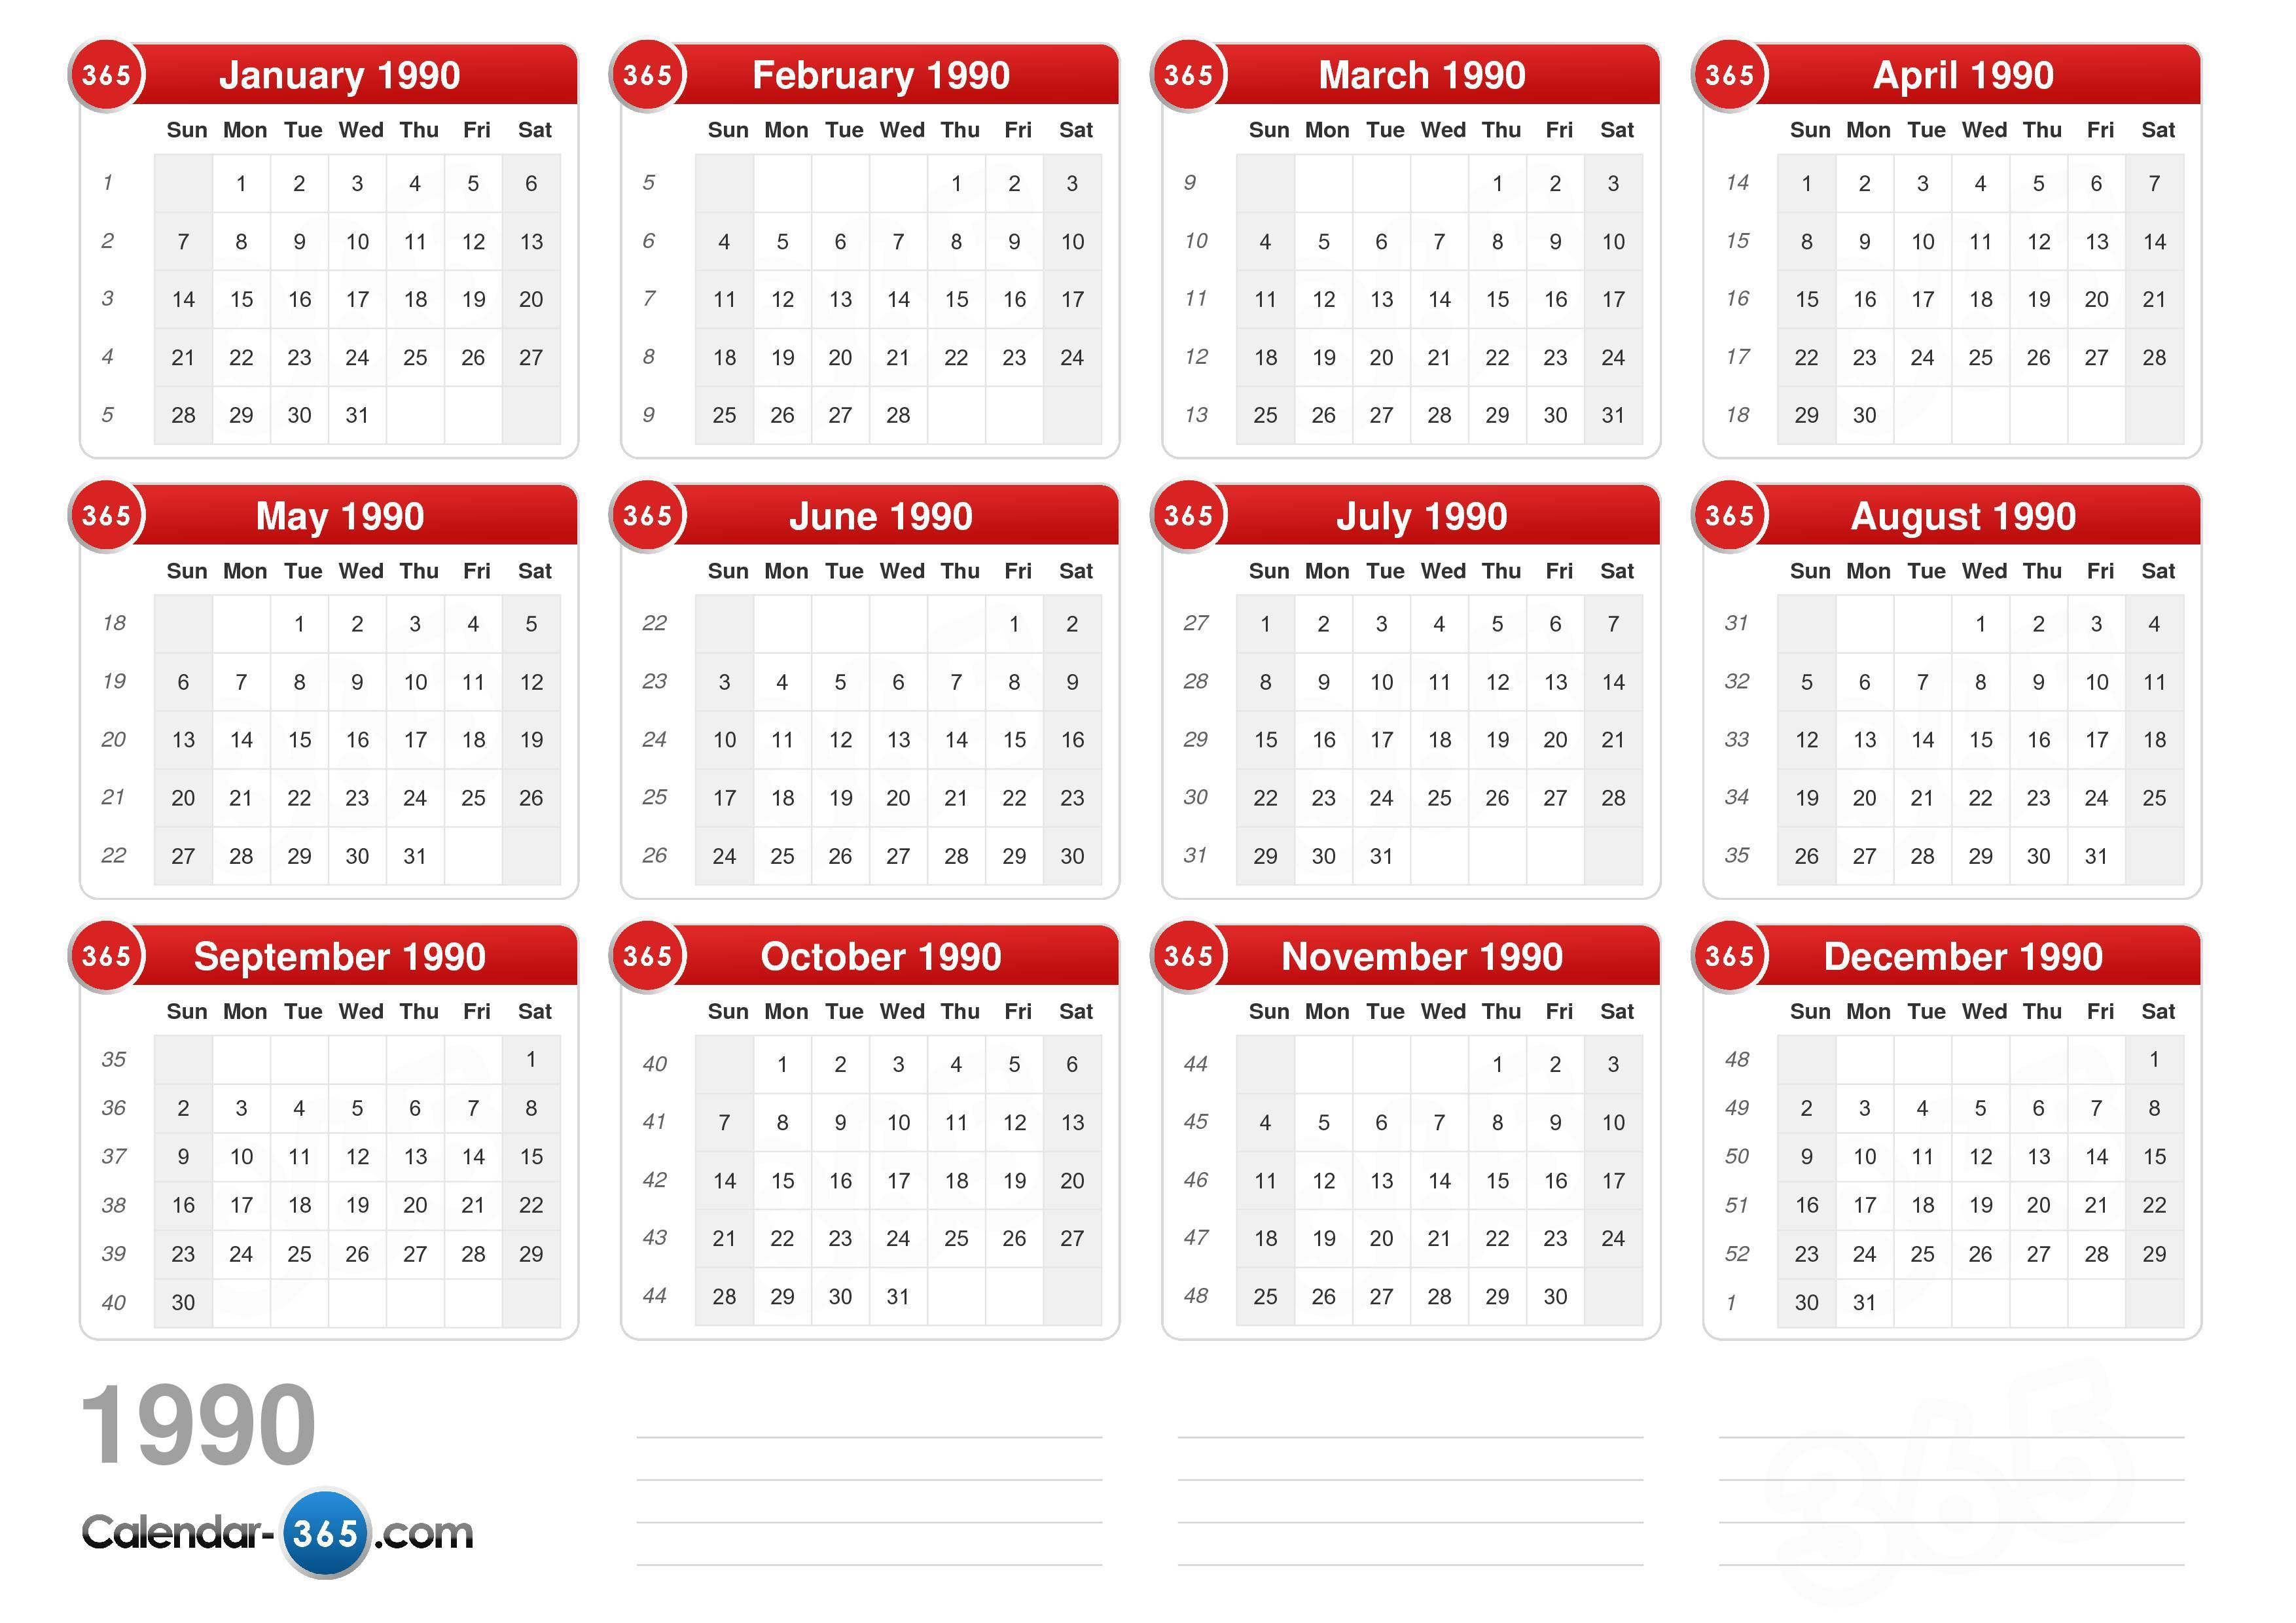 ... calendar without holidays landscape format 1 page 1990 calendar 145 15